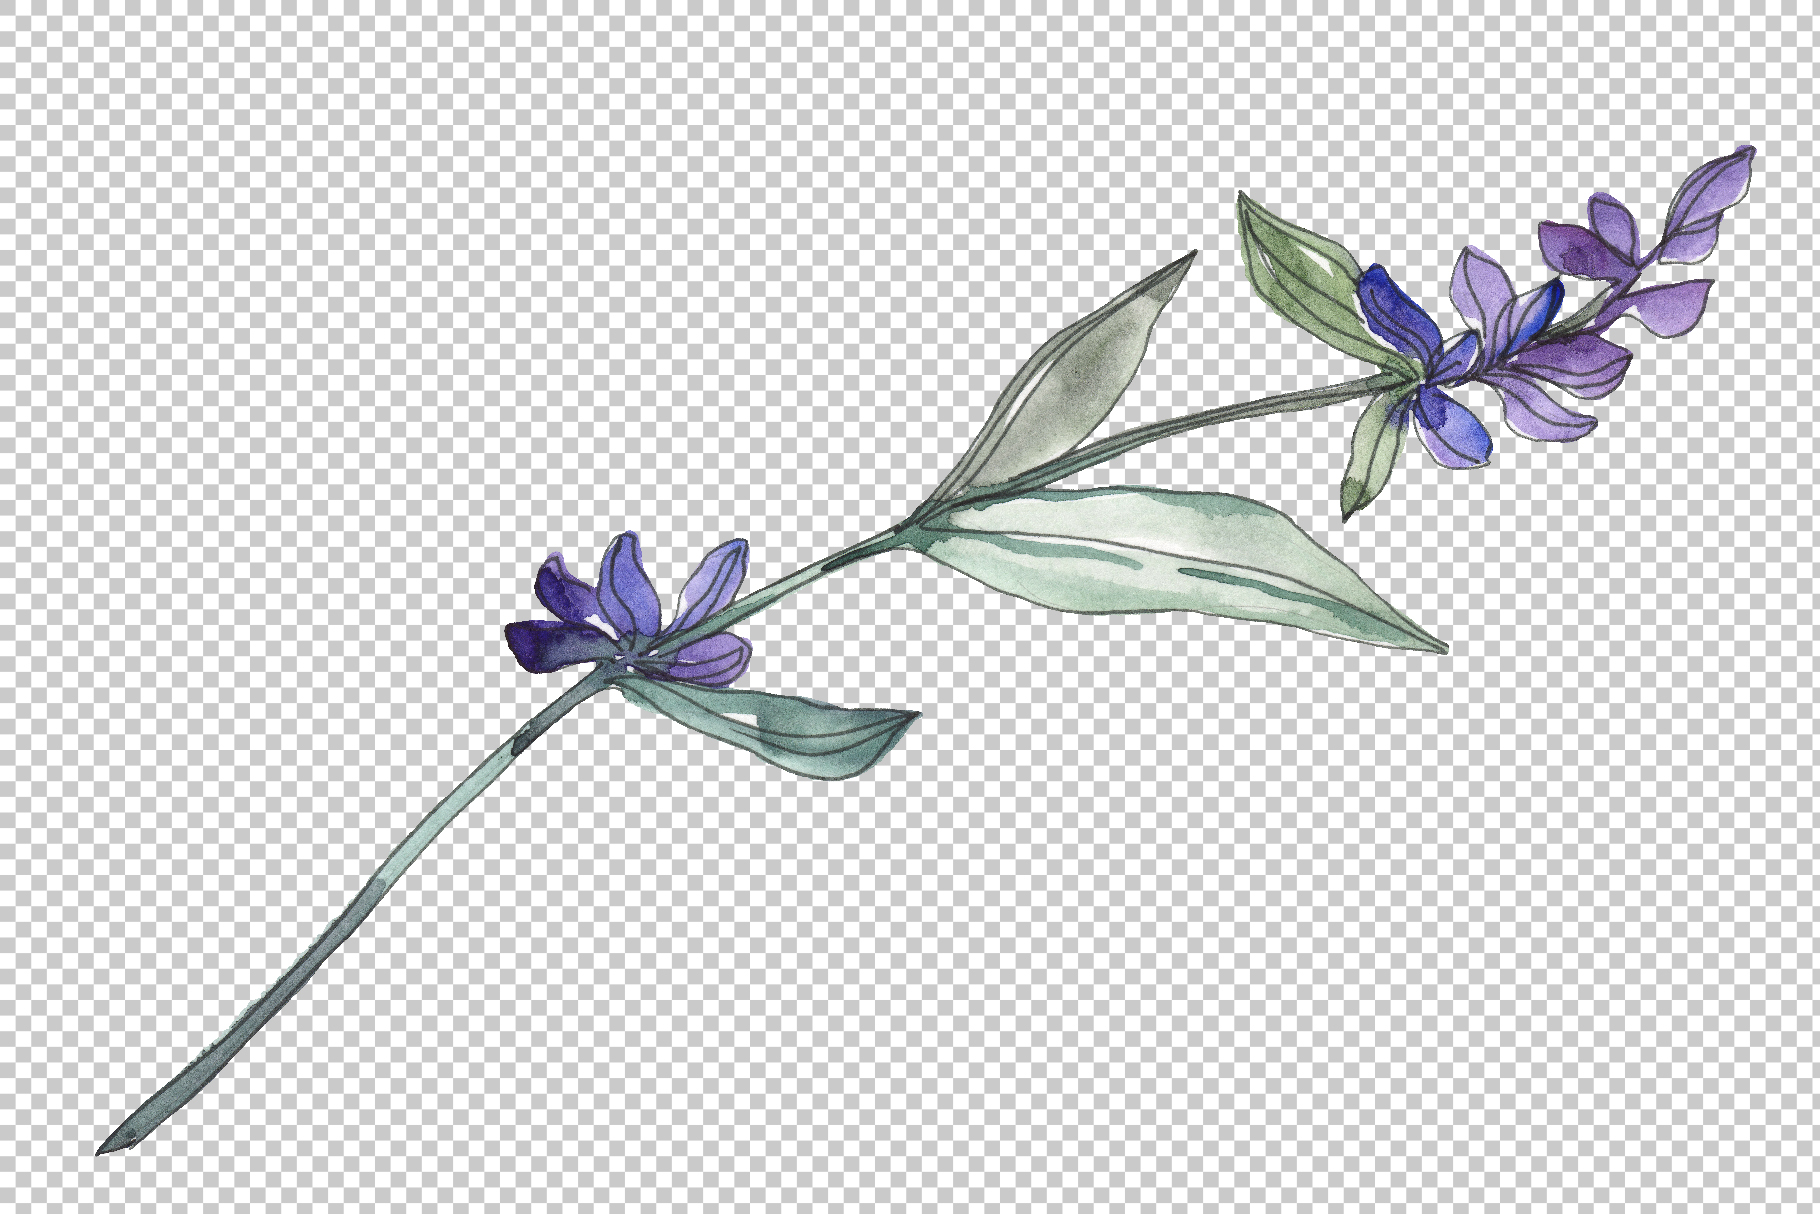 Bouquet summer breeze lavender watercolor png example image 6